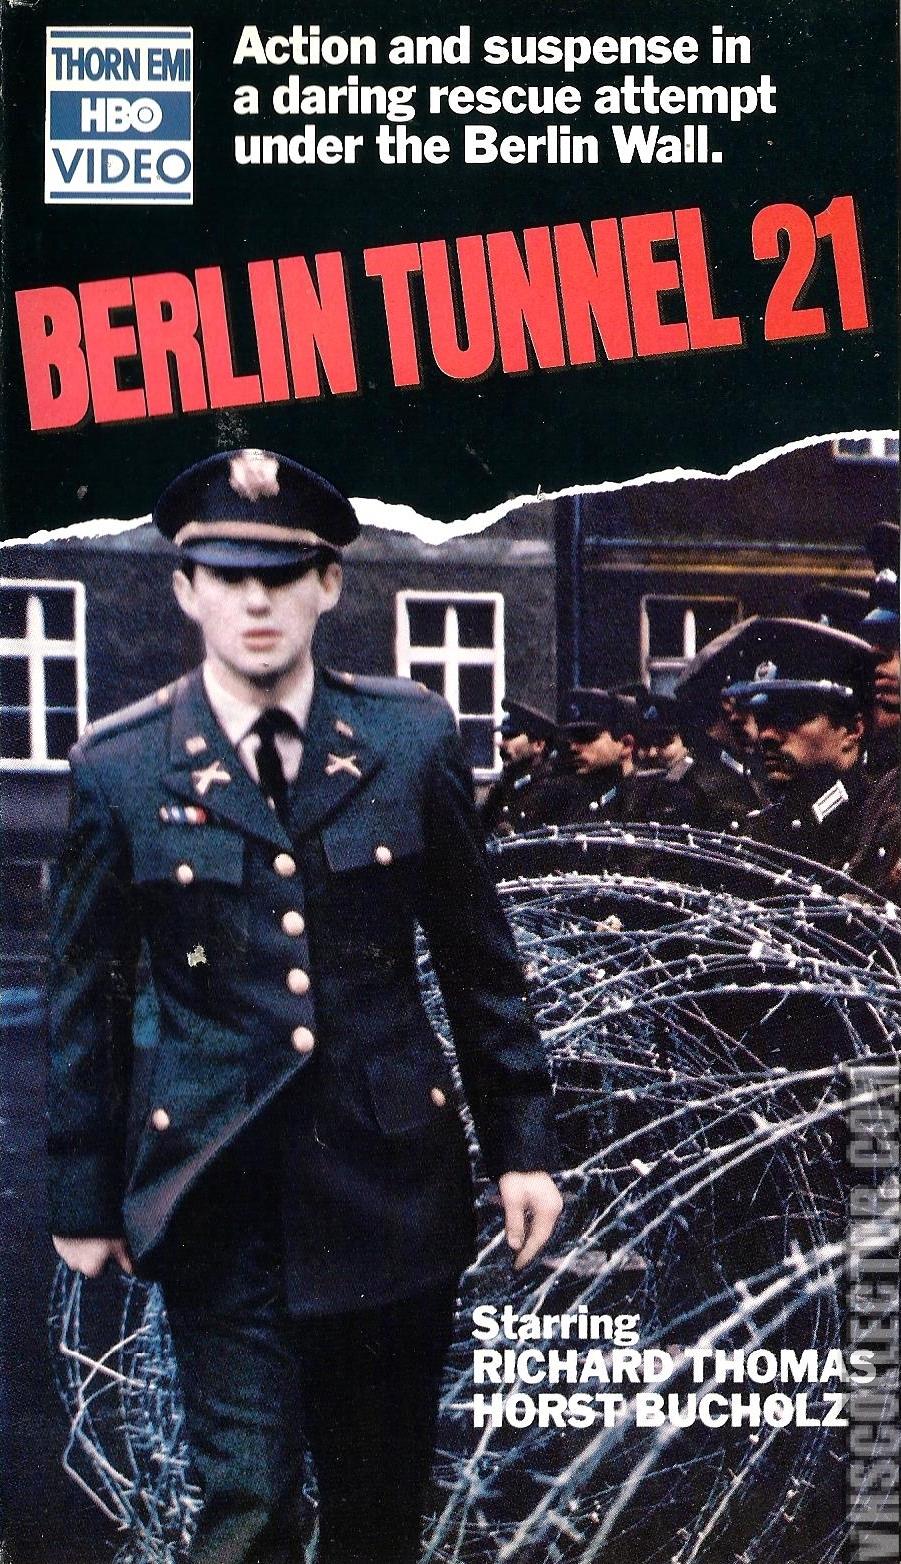 Richard Thomas in Berlin Tunnel 21 (1981)